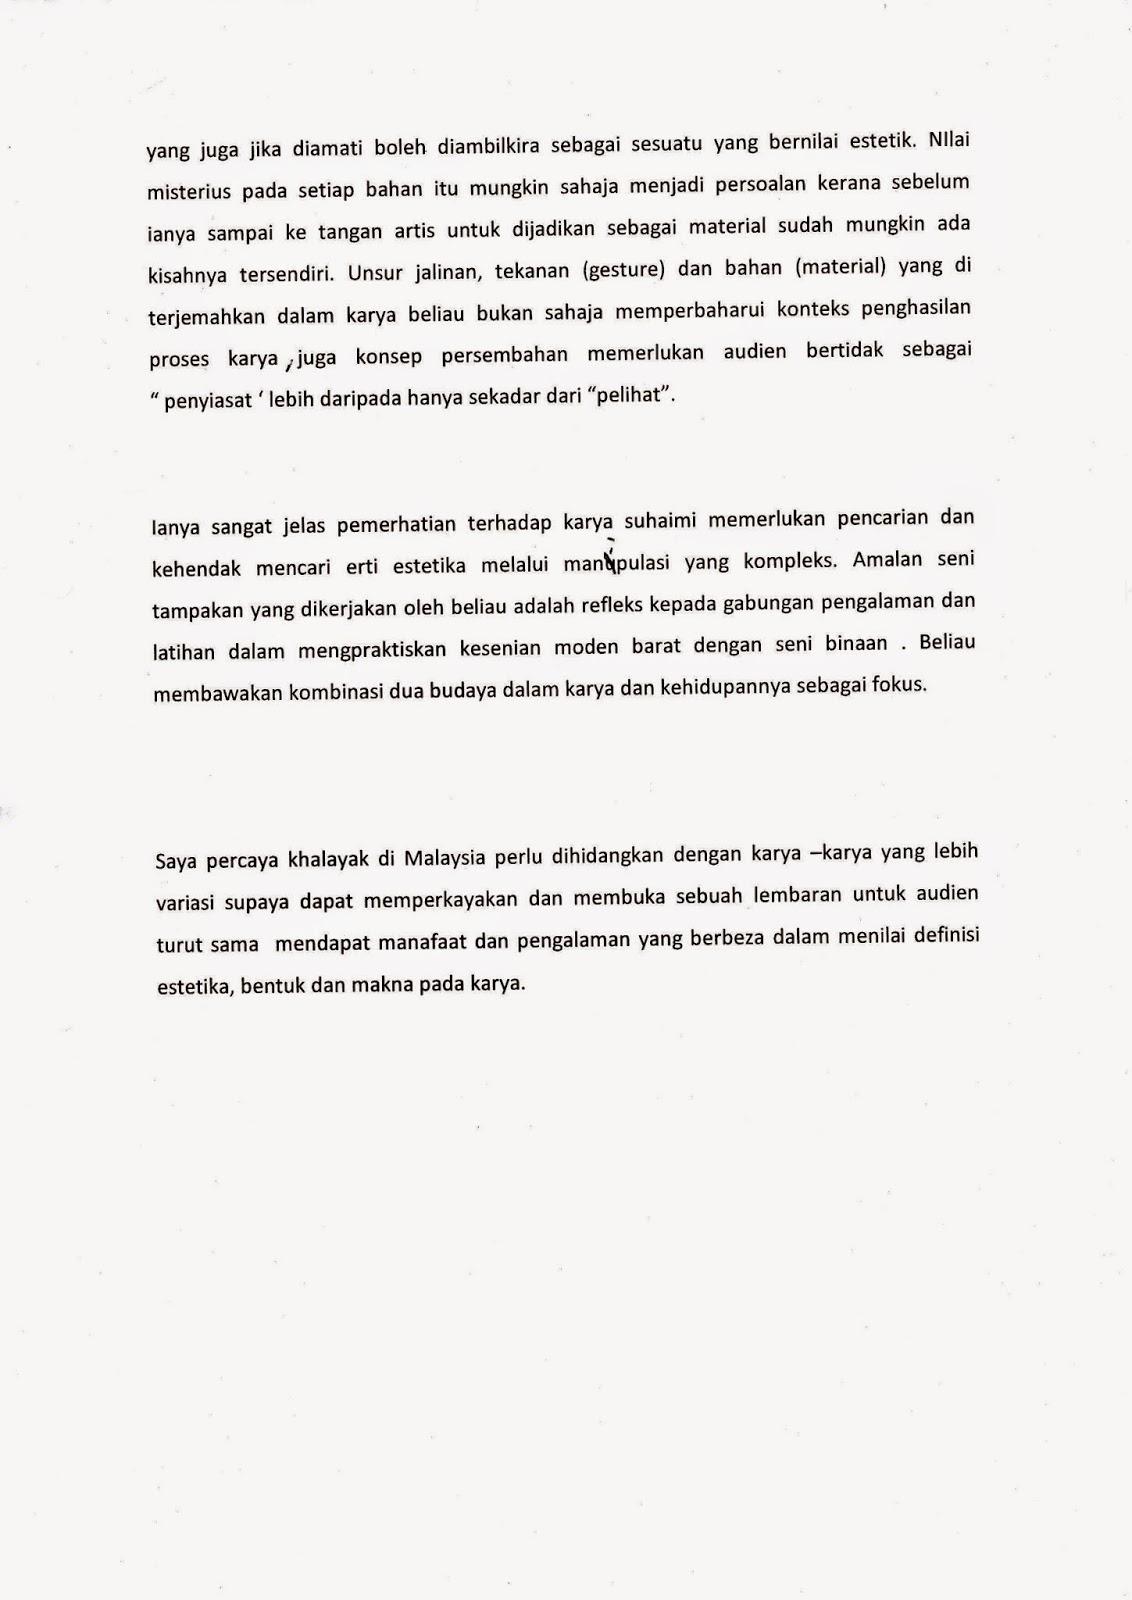 essay tentang selamatkan indonesia